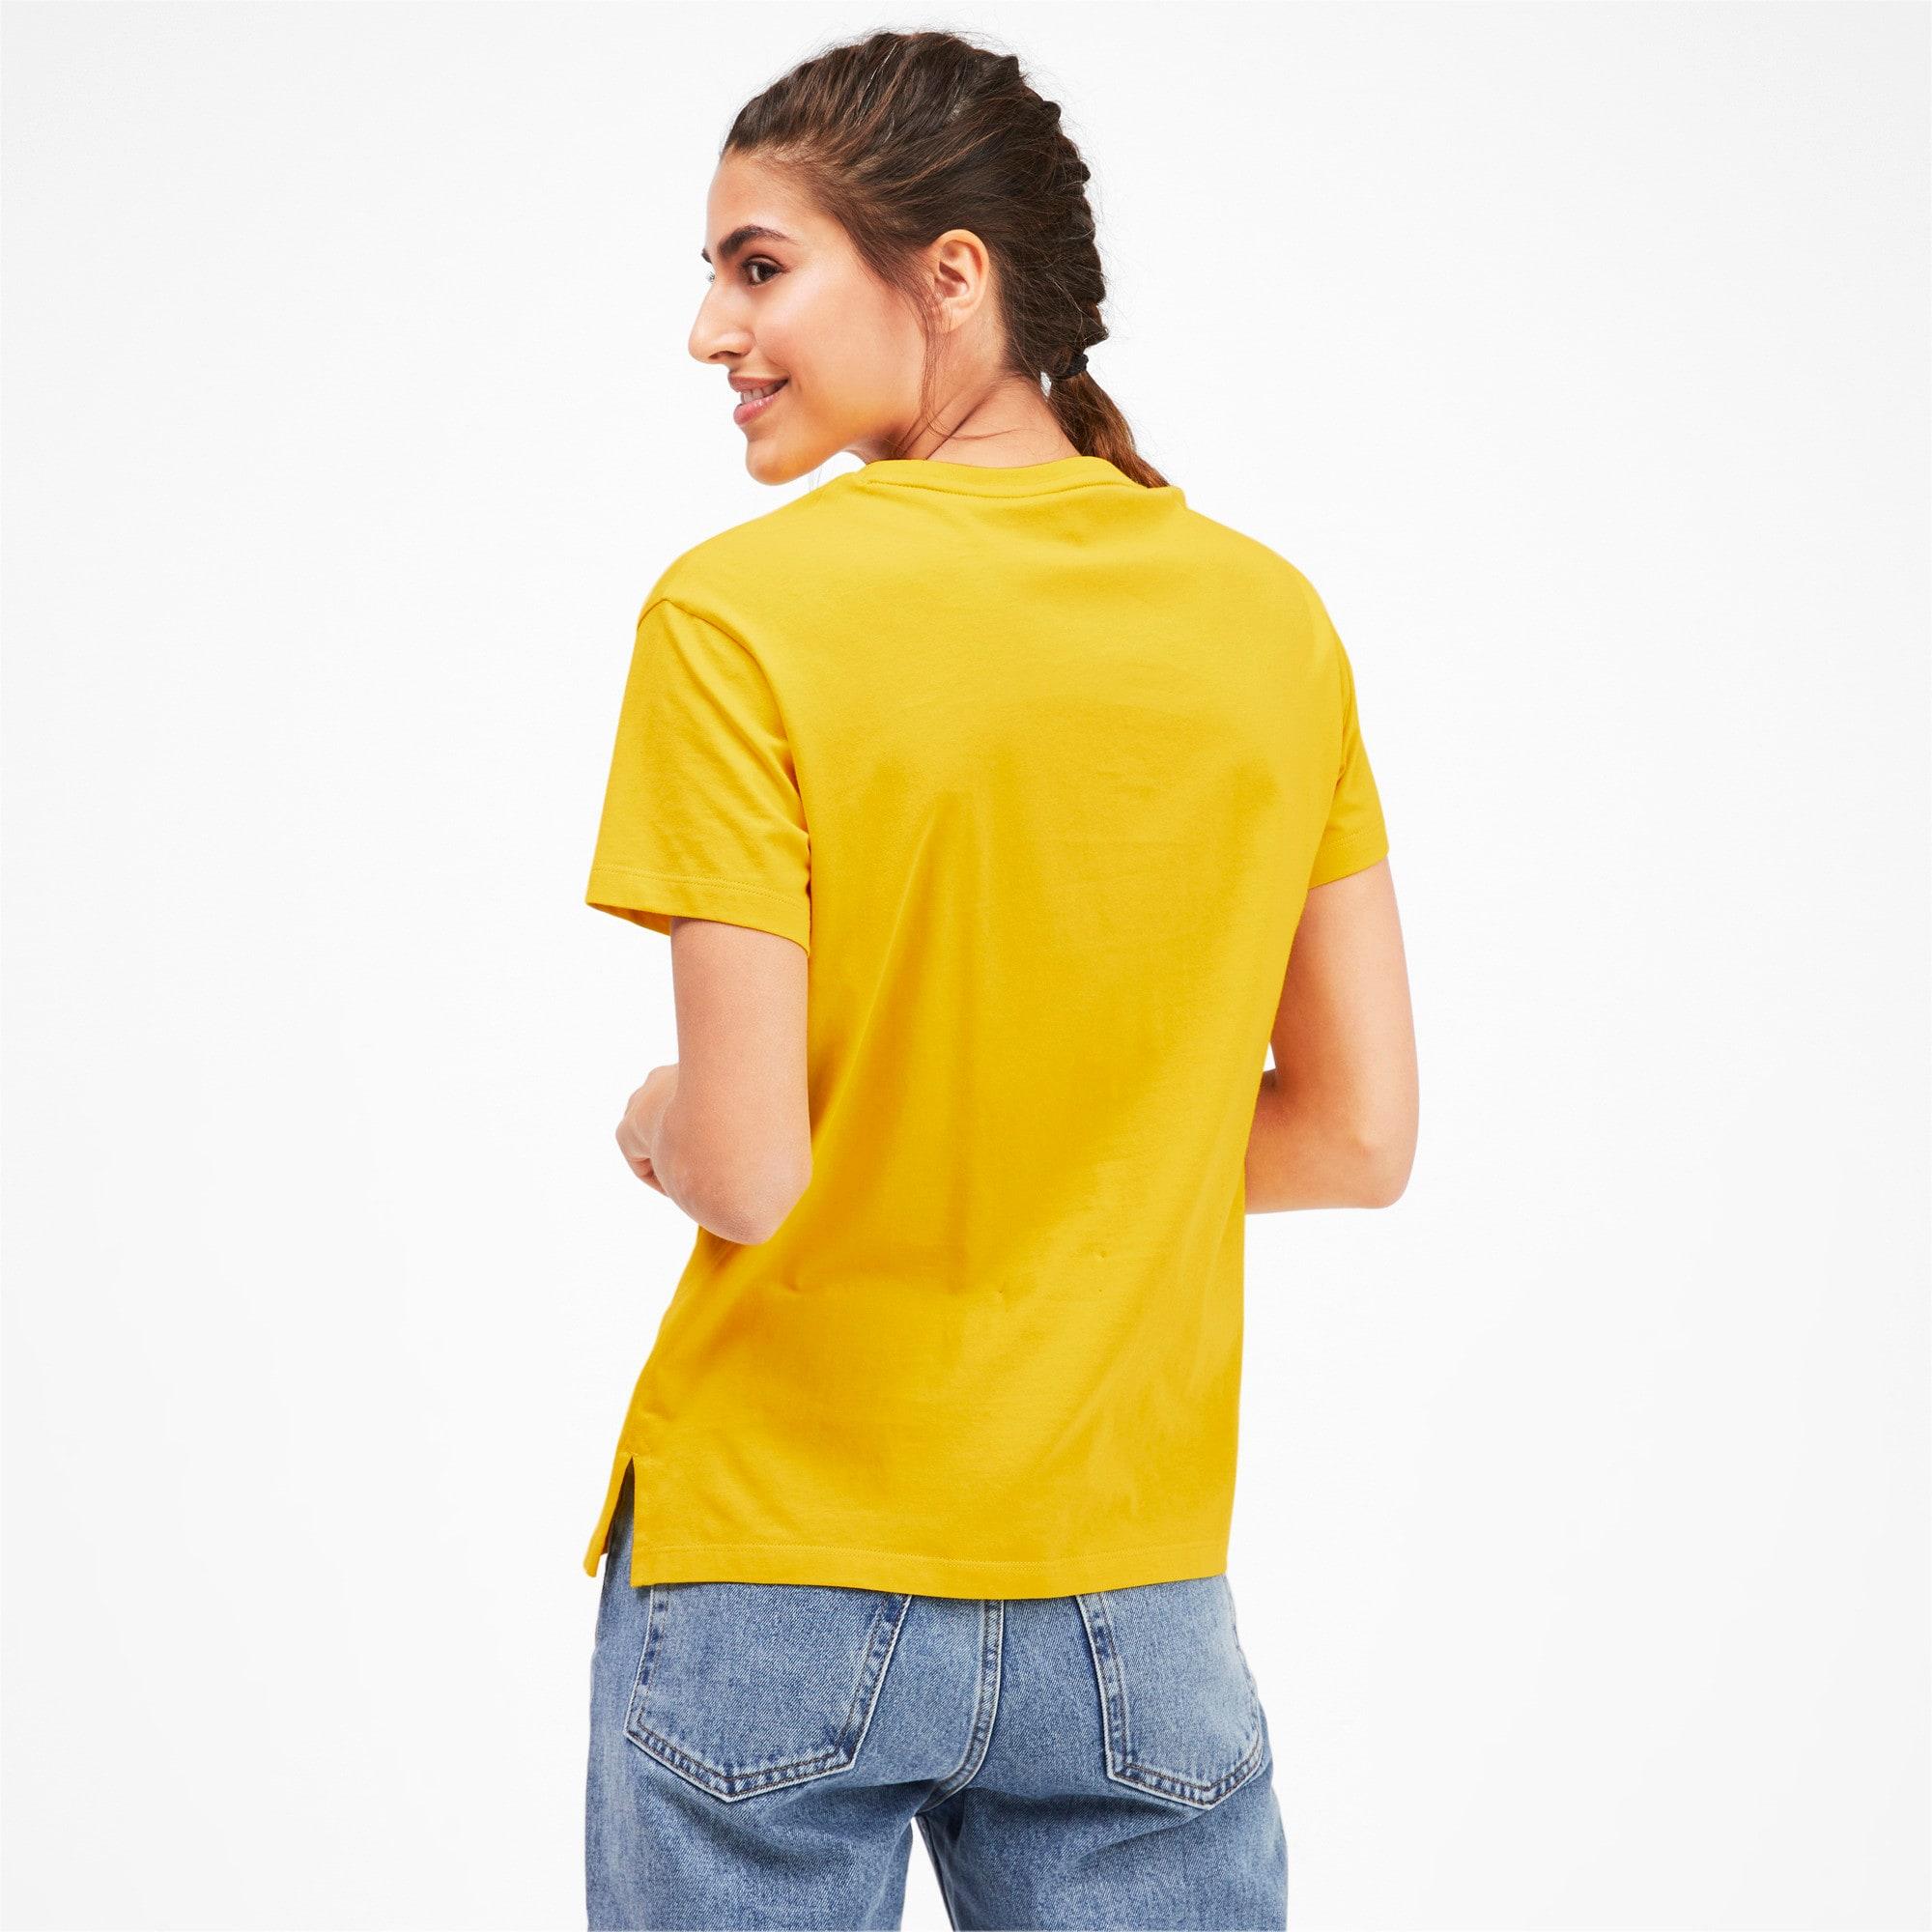 Miniatura 2 de Camiseta Classics con logotipo para mujer, Sulphur, mediano